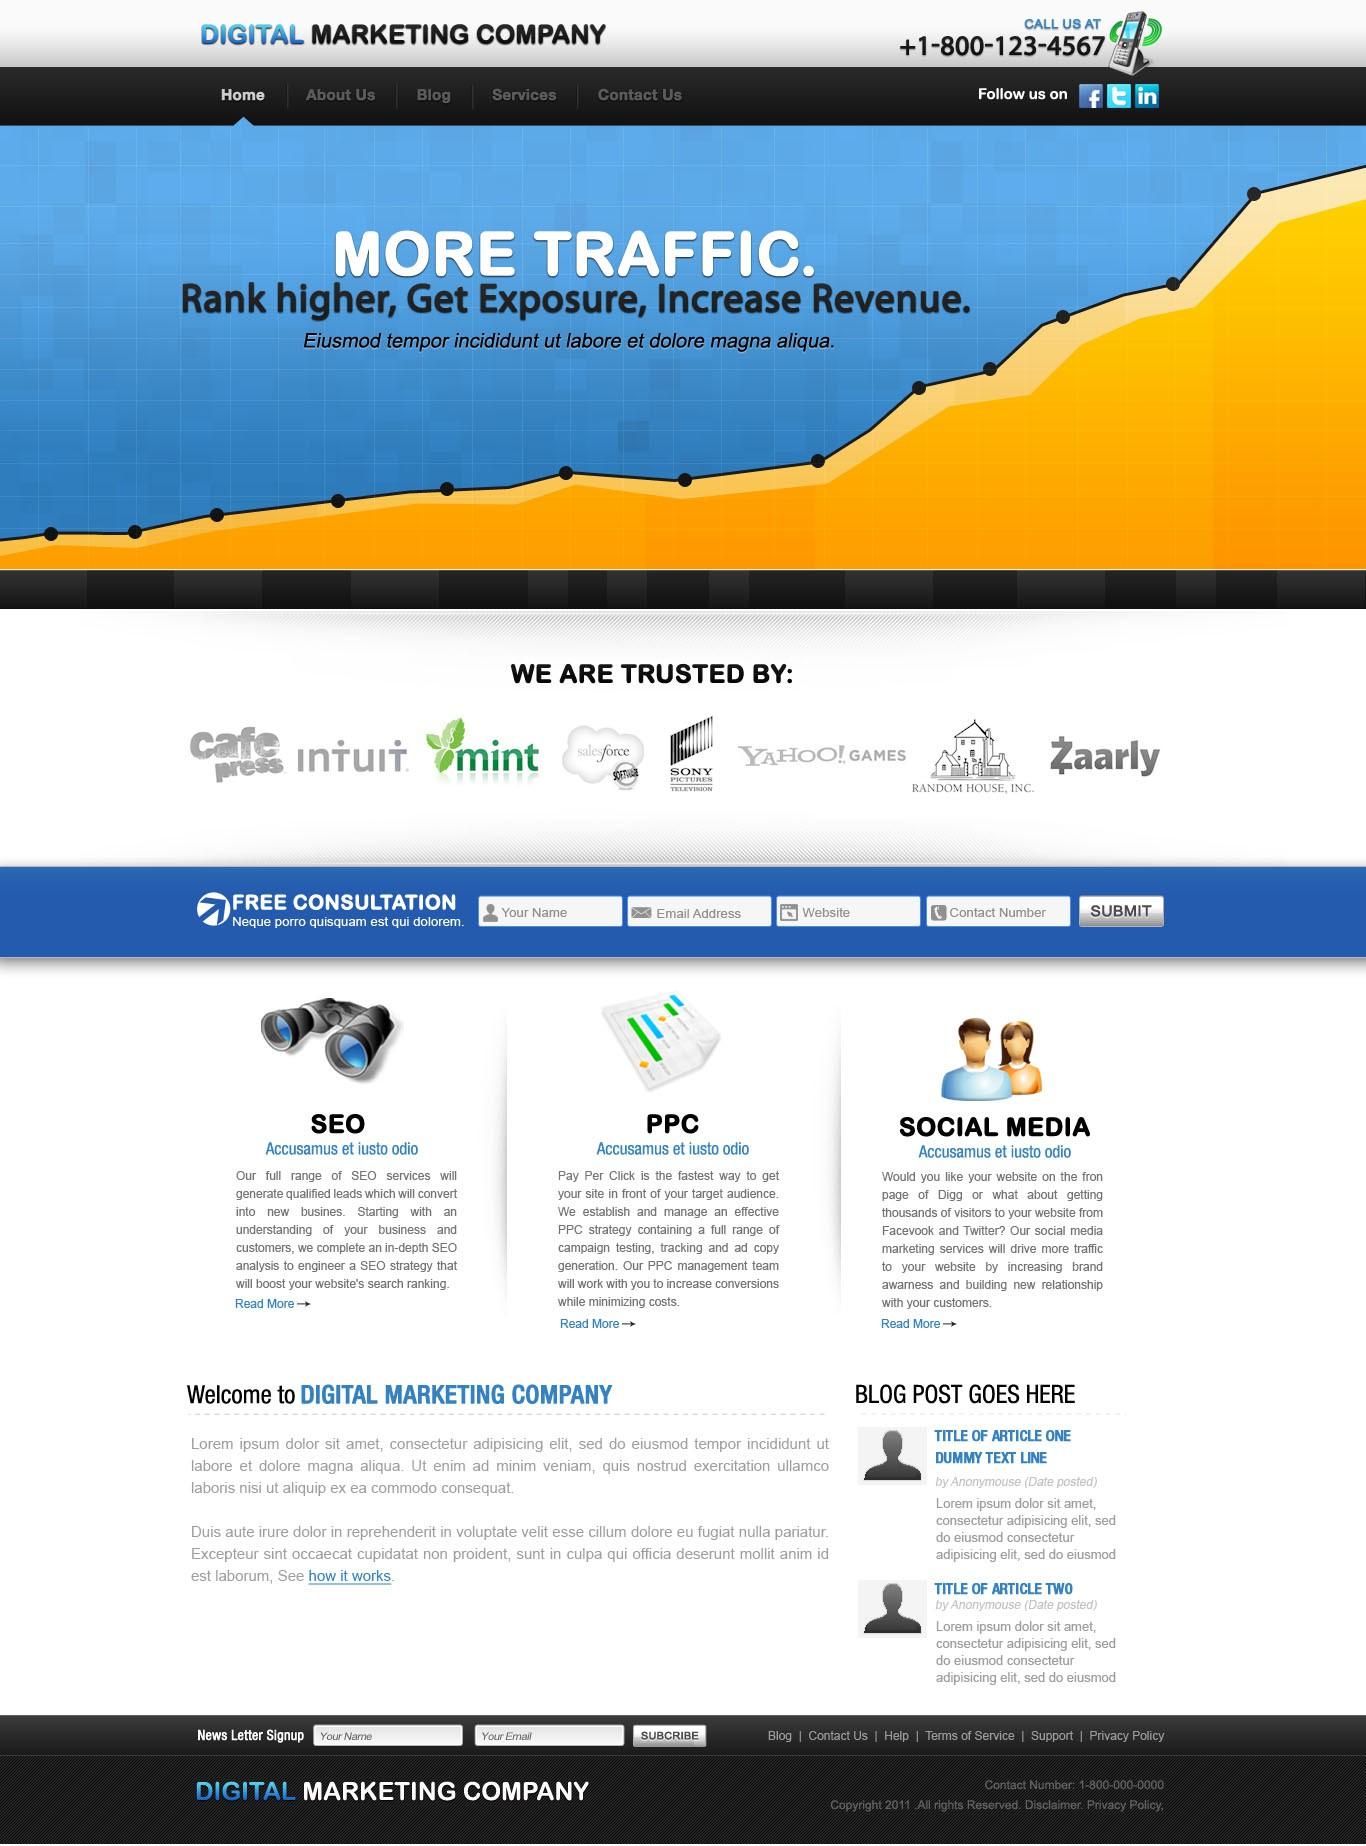 Marketing/SEO Company needs a SICK new website design!